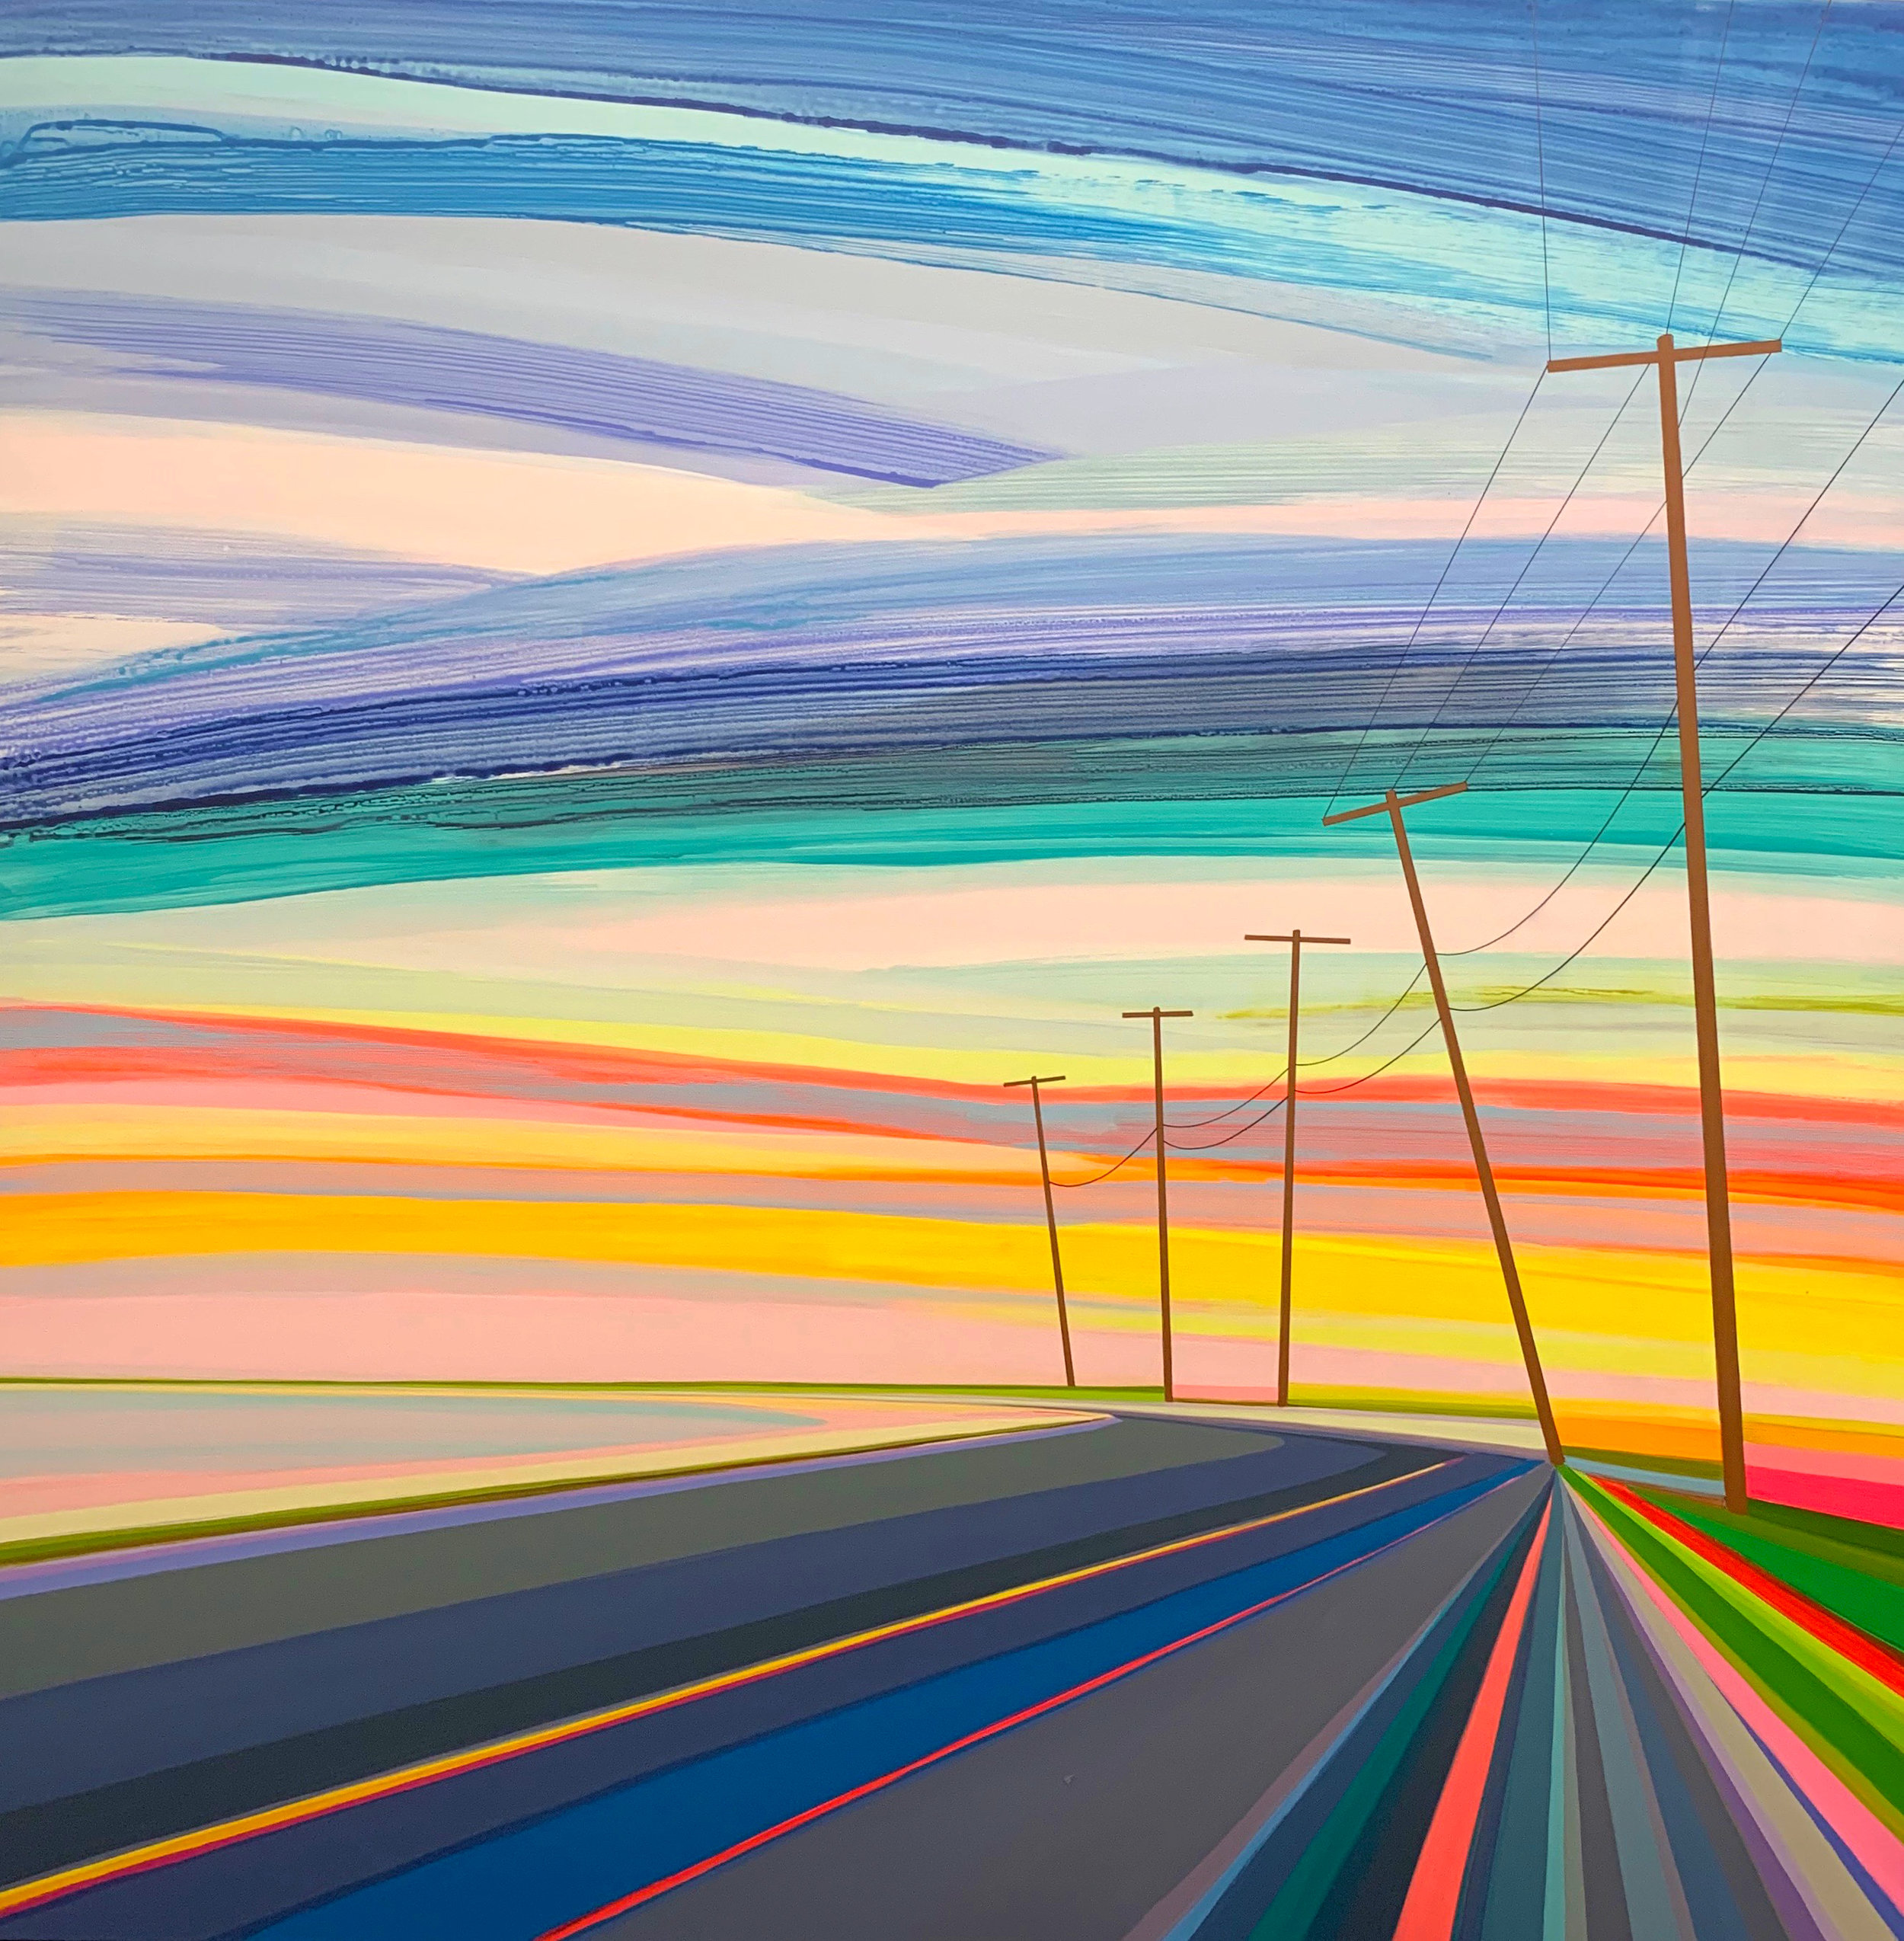 ROMAN FINE ART, Grant Haffner, Goodnight Long Beach, 2019, Acrylic and graphite on panel, 48x48in.jpg